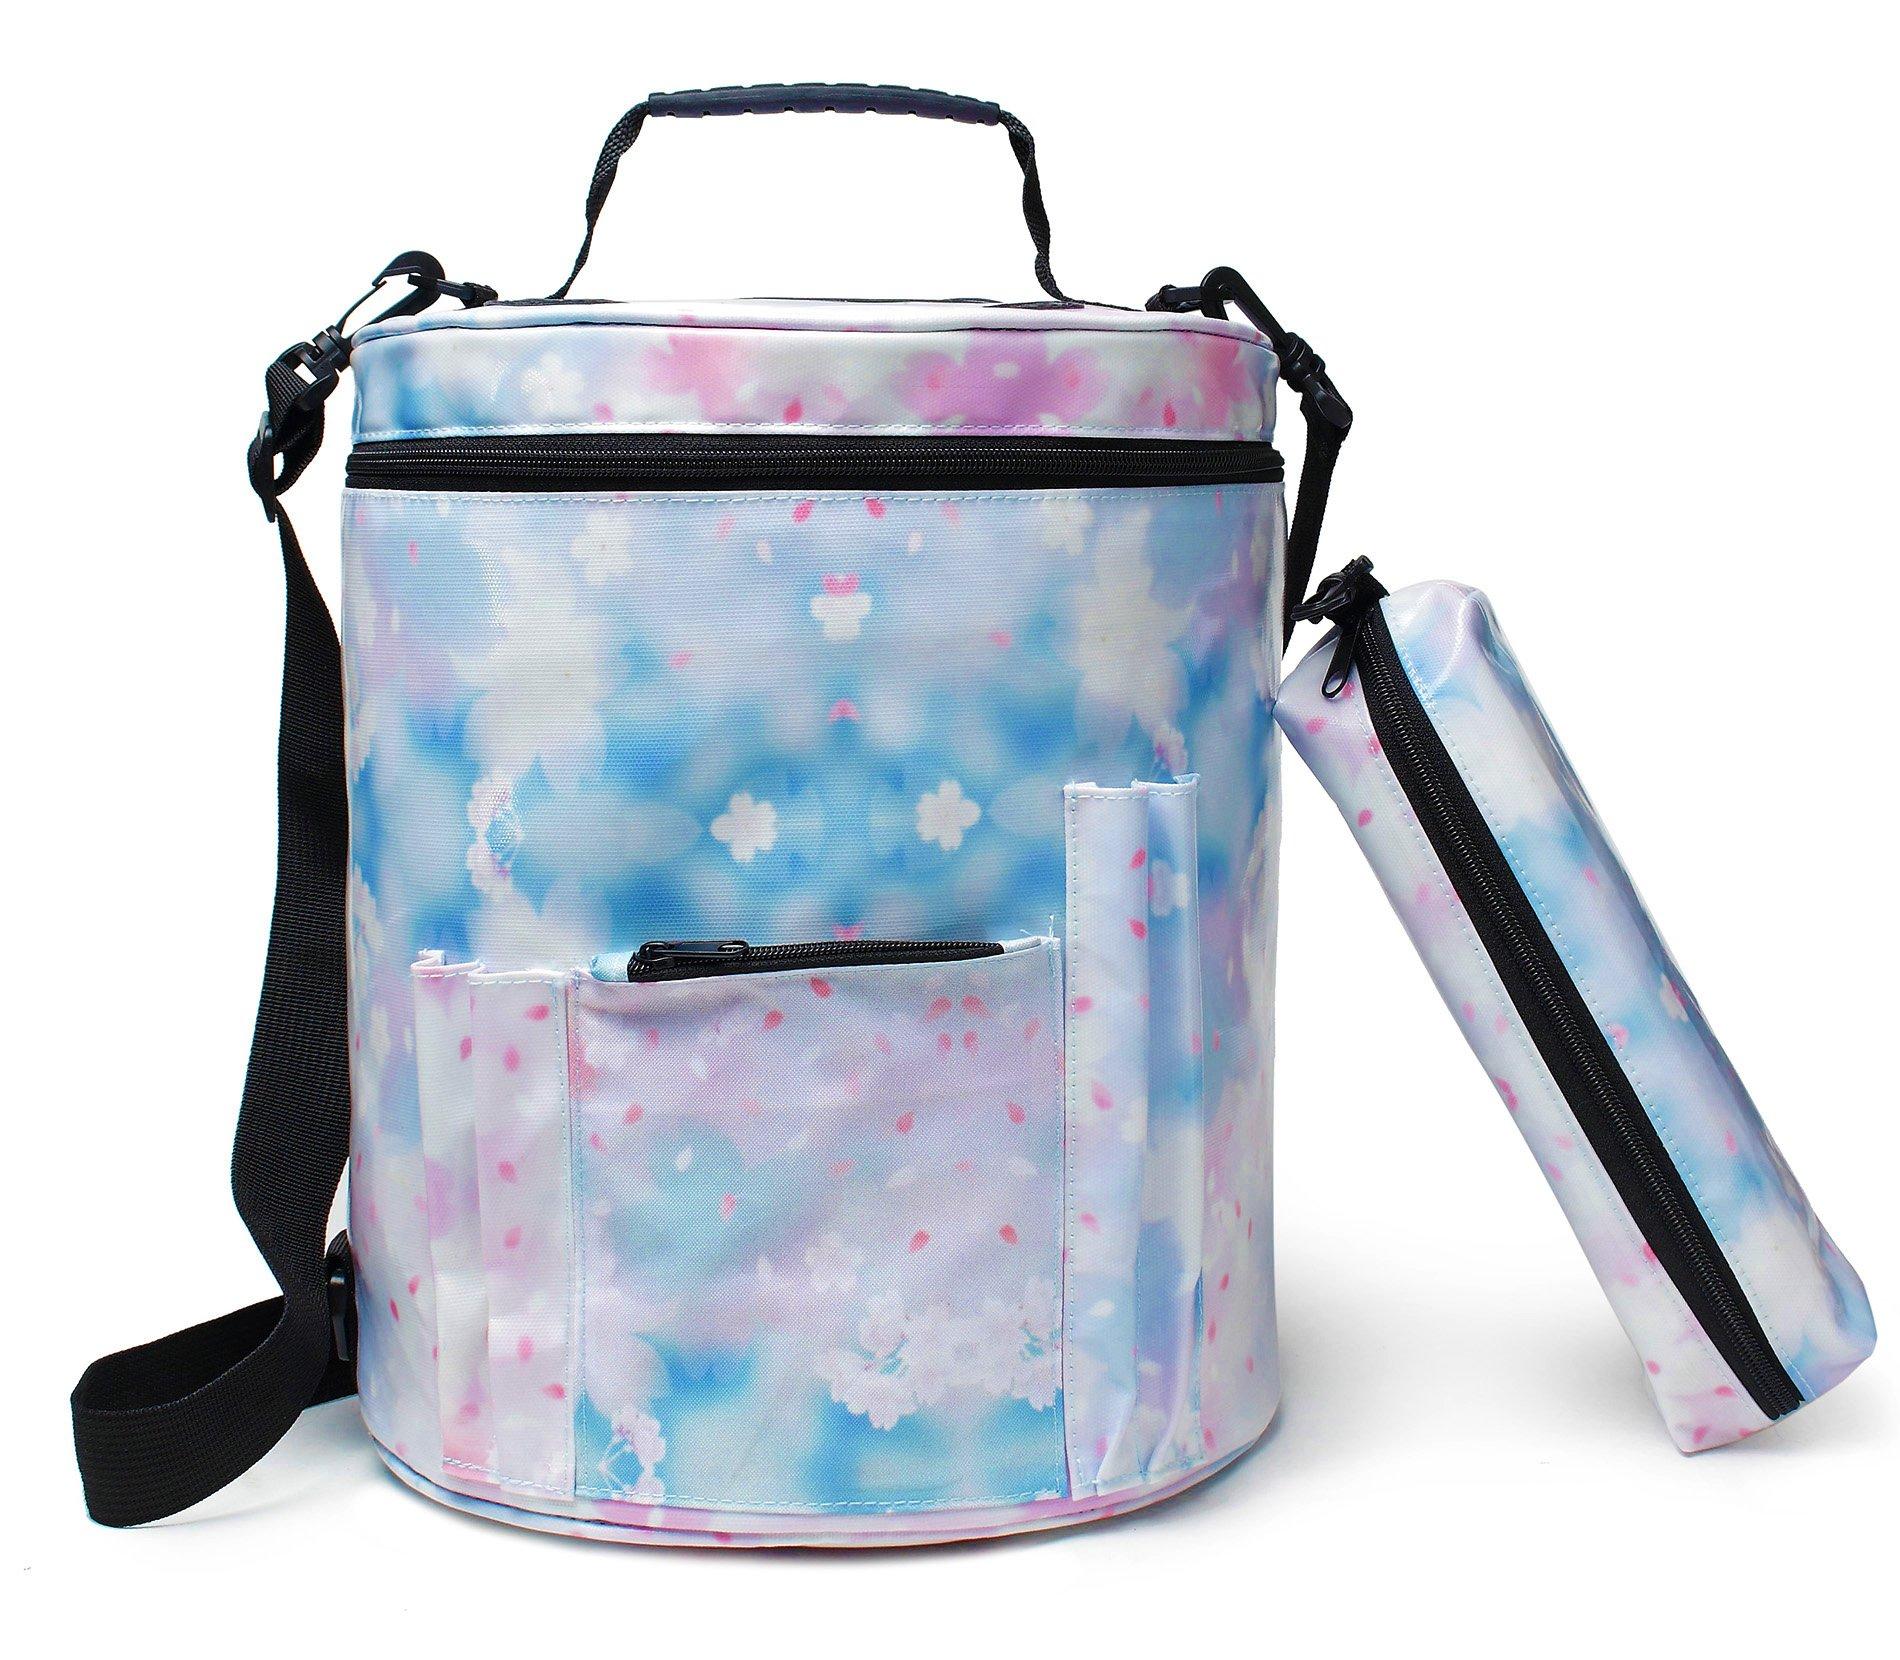 goldwheat Knitting Bag Waterproof Yarn Storage Organizer Bag Large Crochet Bag with Knitting Accessories Case,Blue